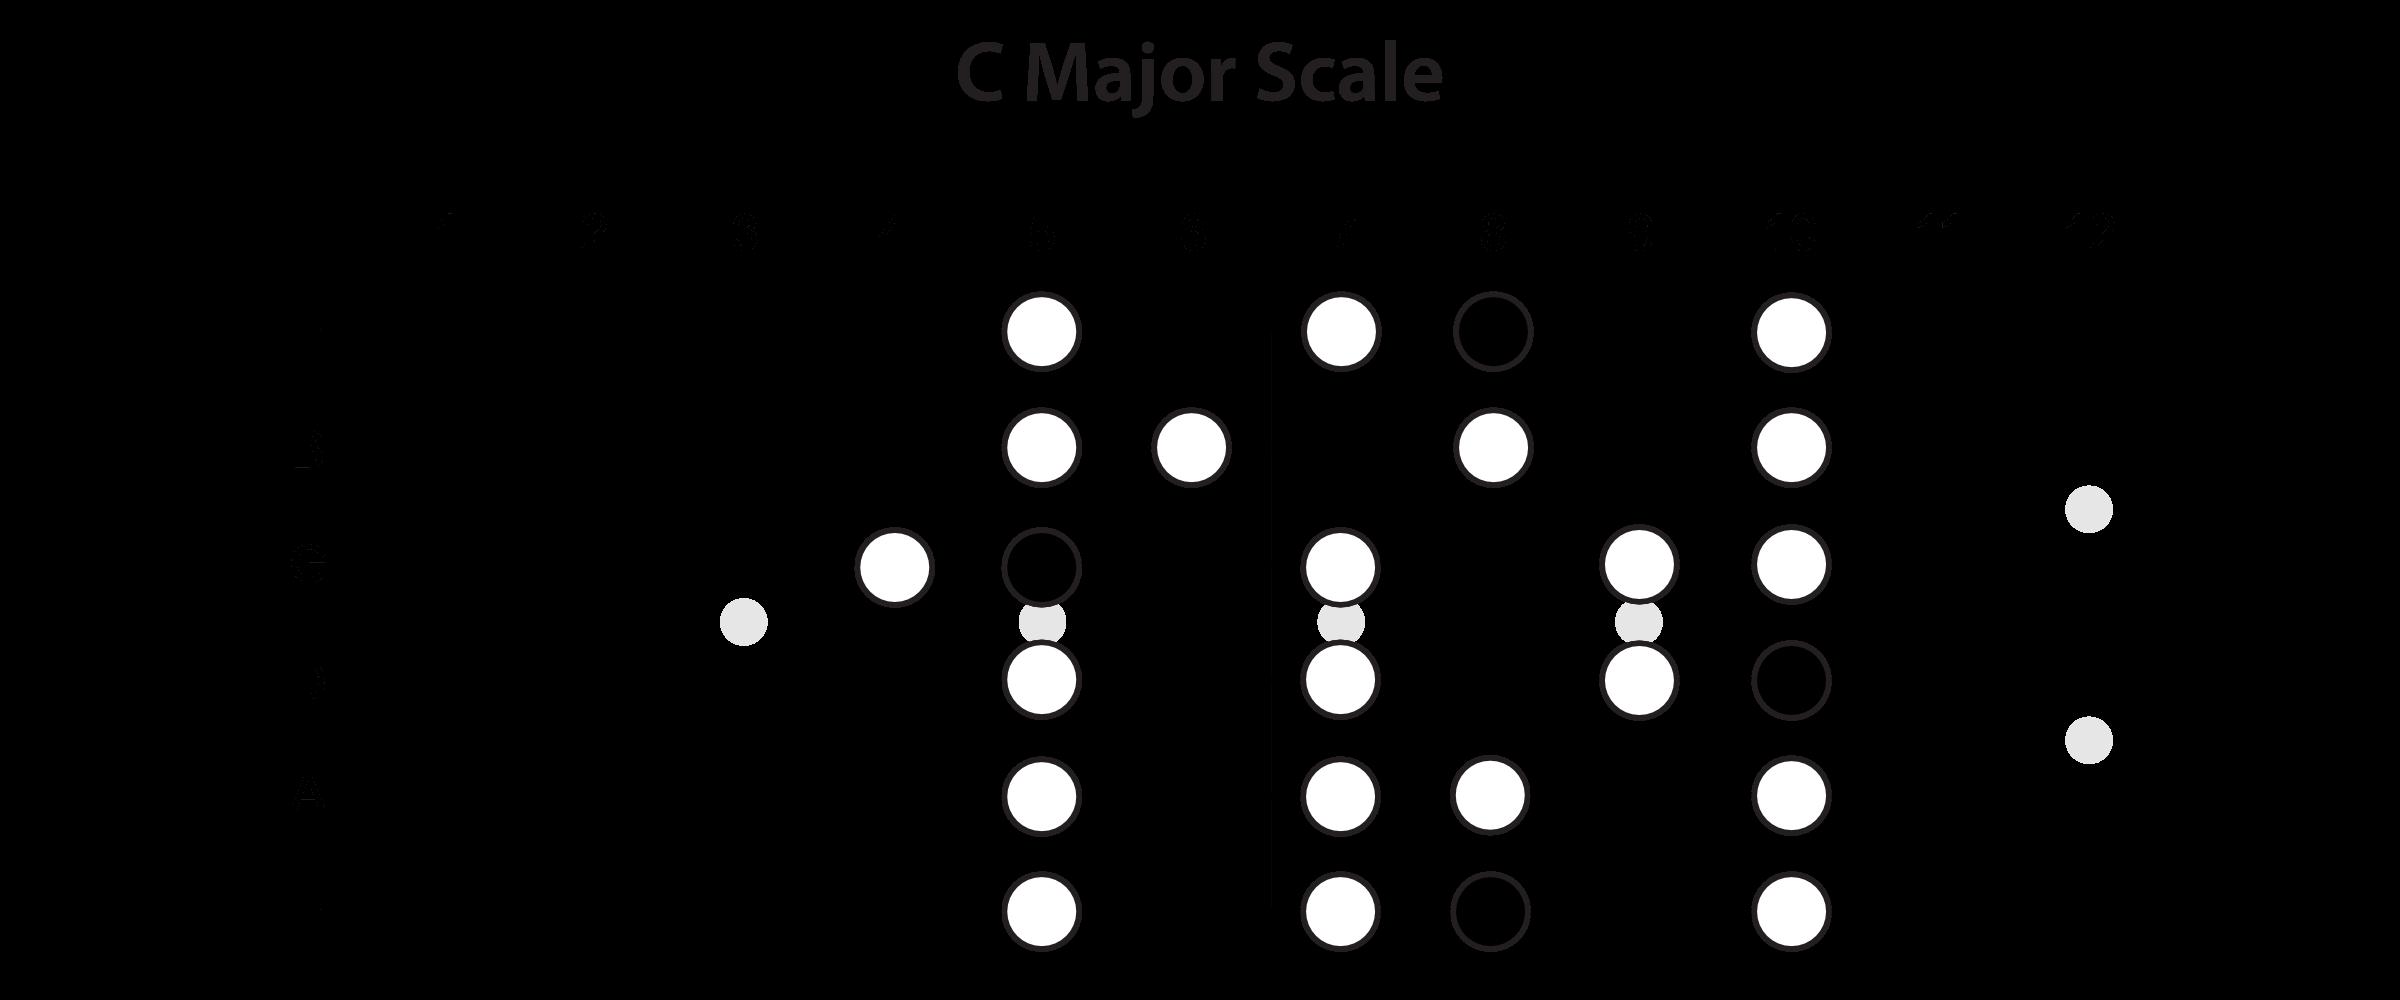 Major Scale Horizontal View